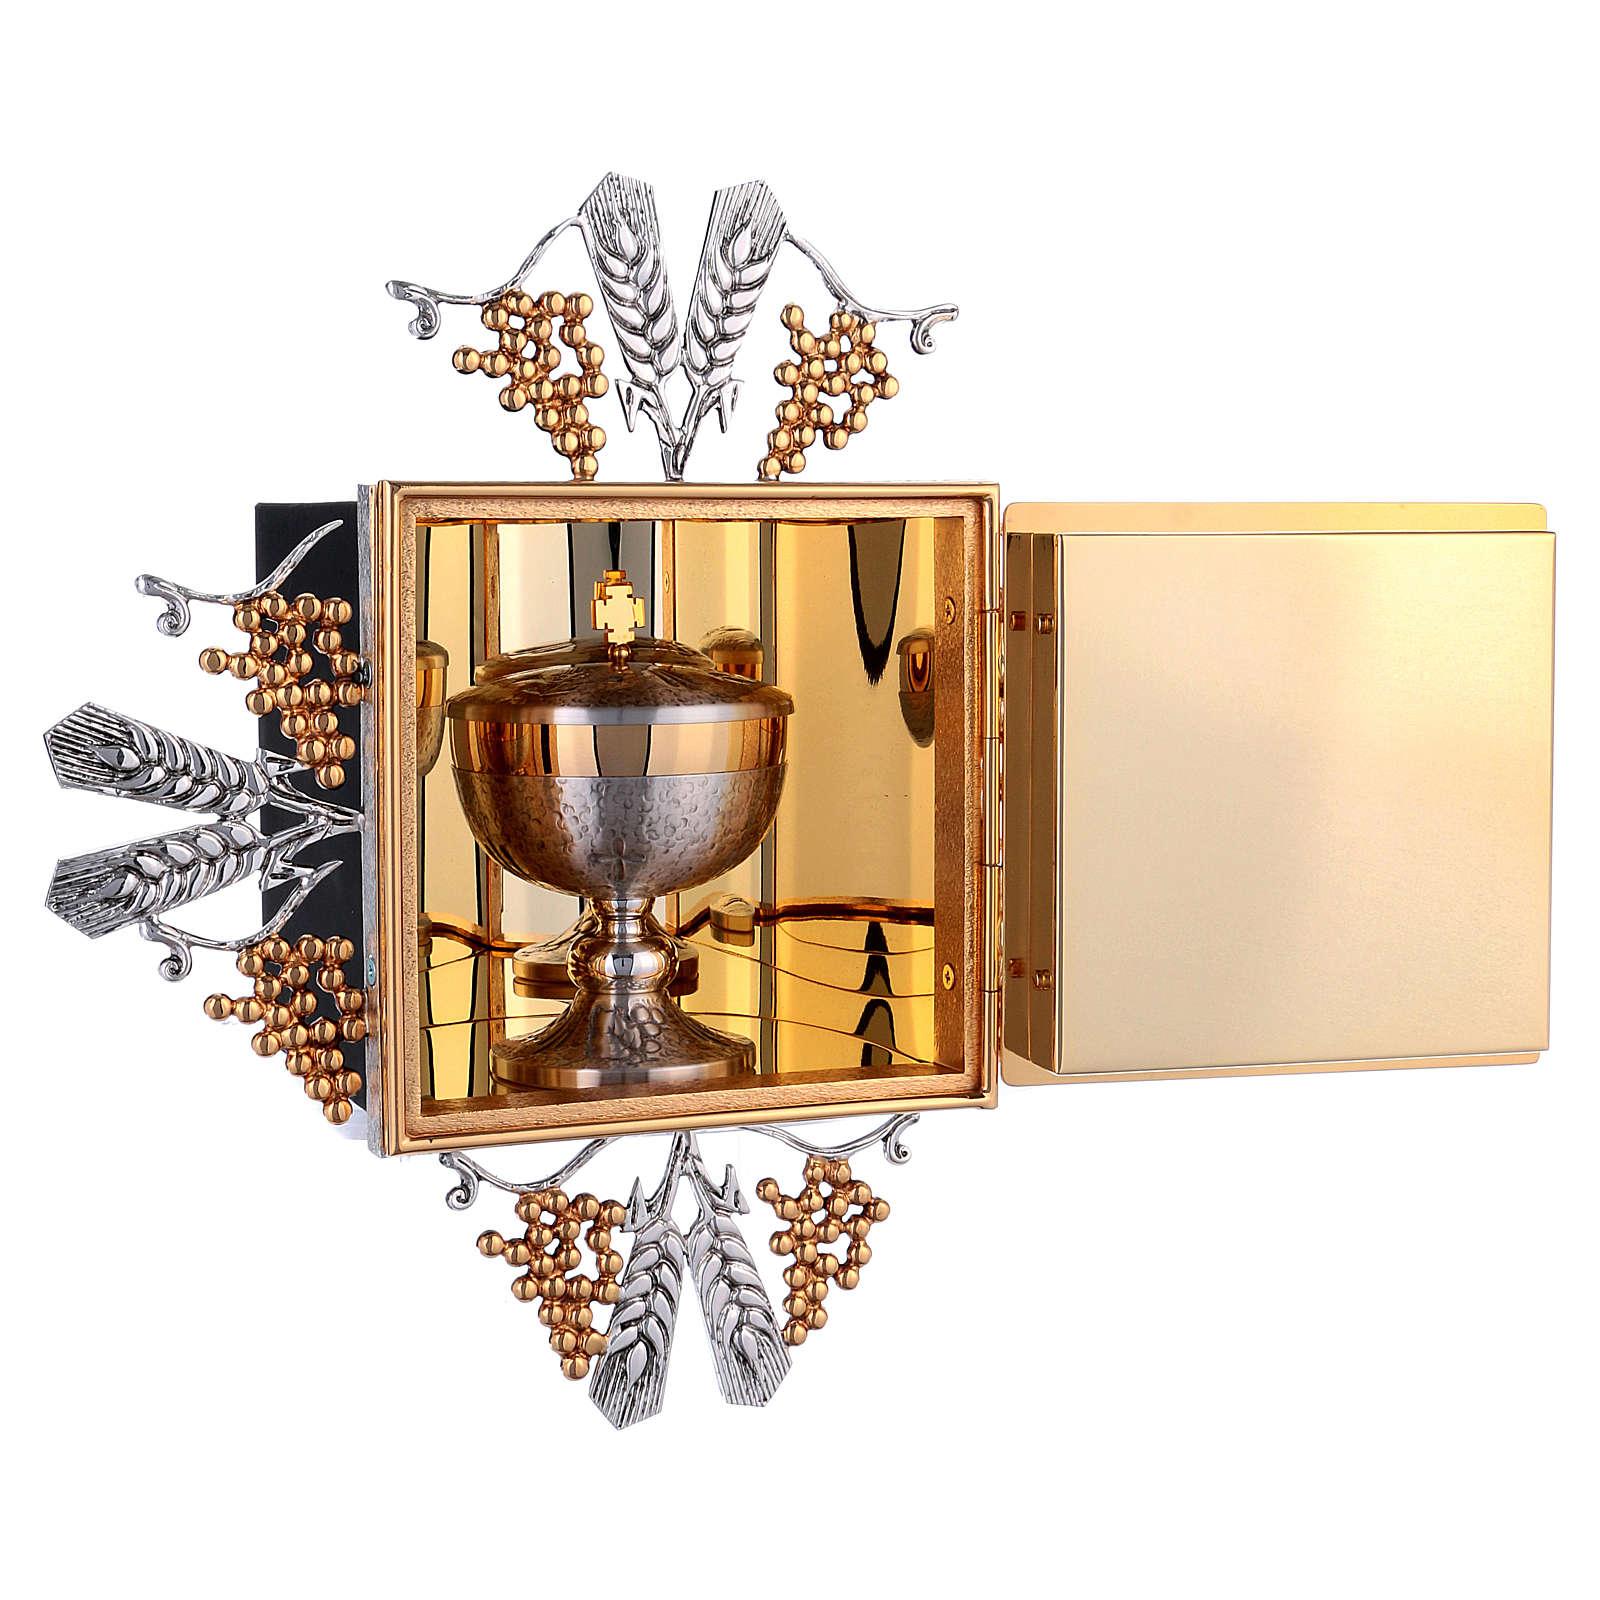 Tabernacle laiton fondu doré eucharistie 4